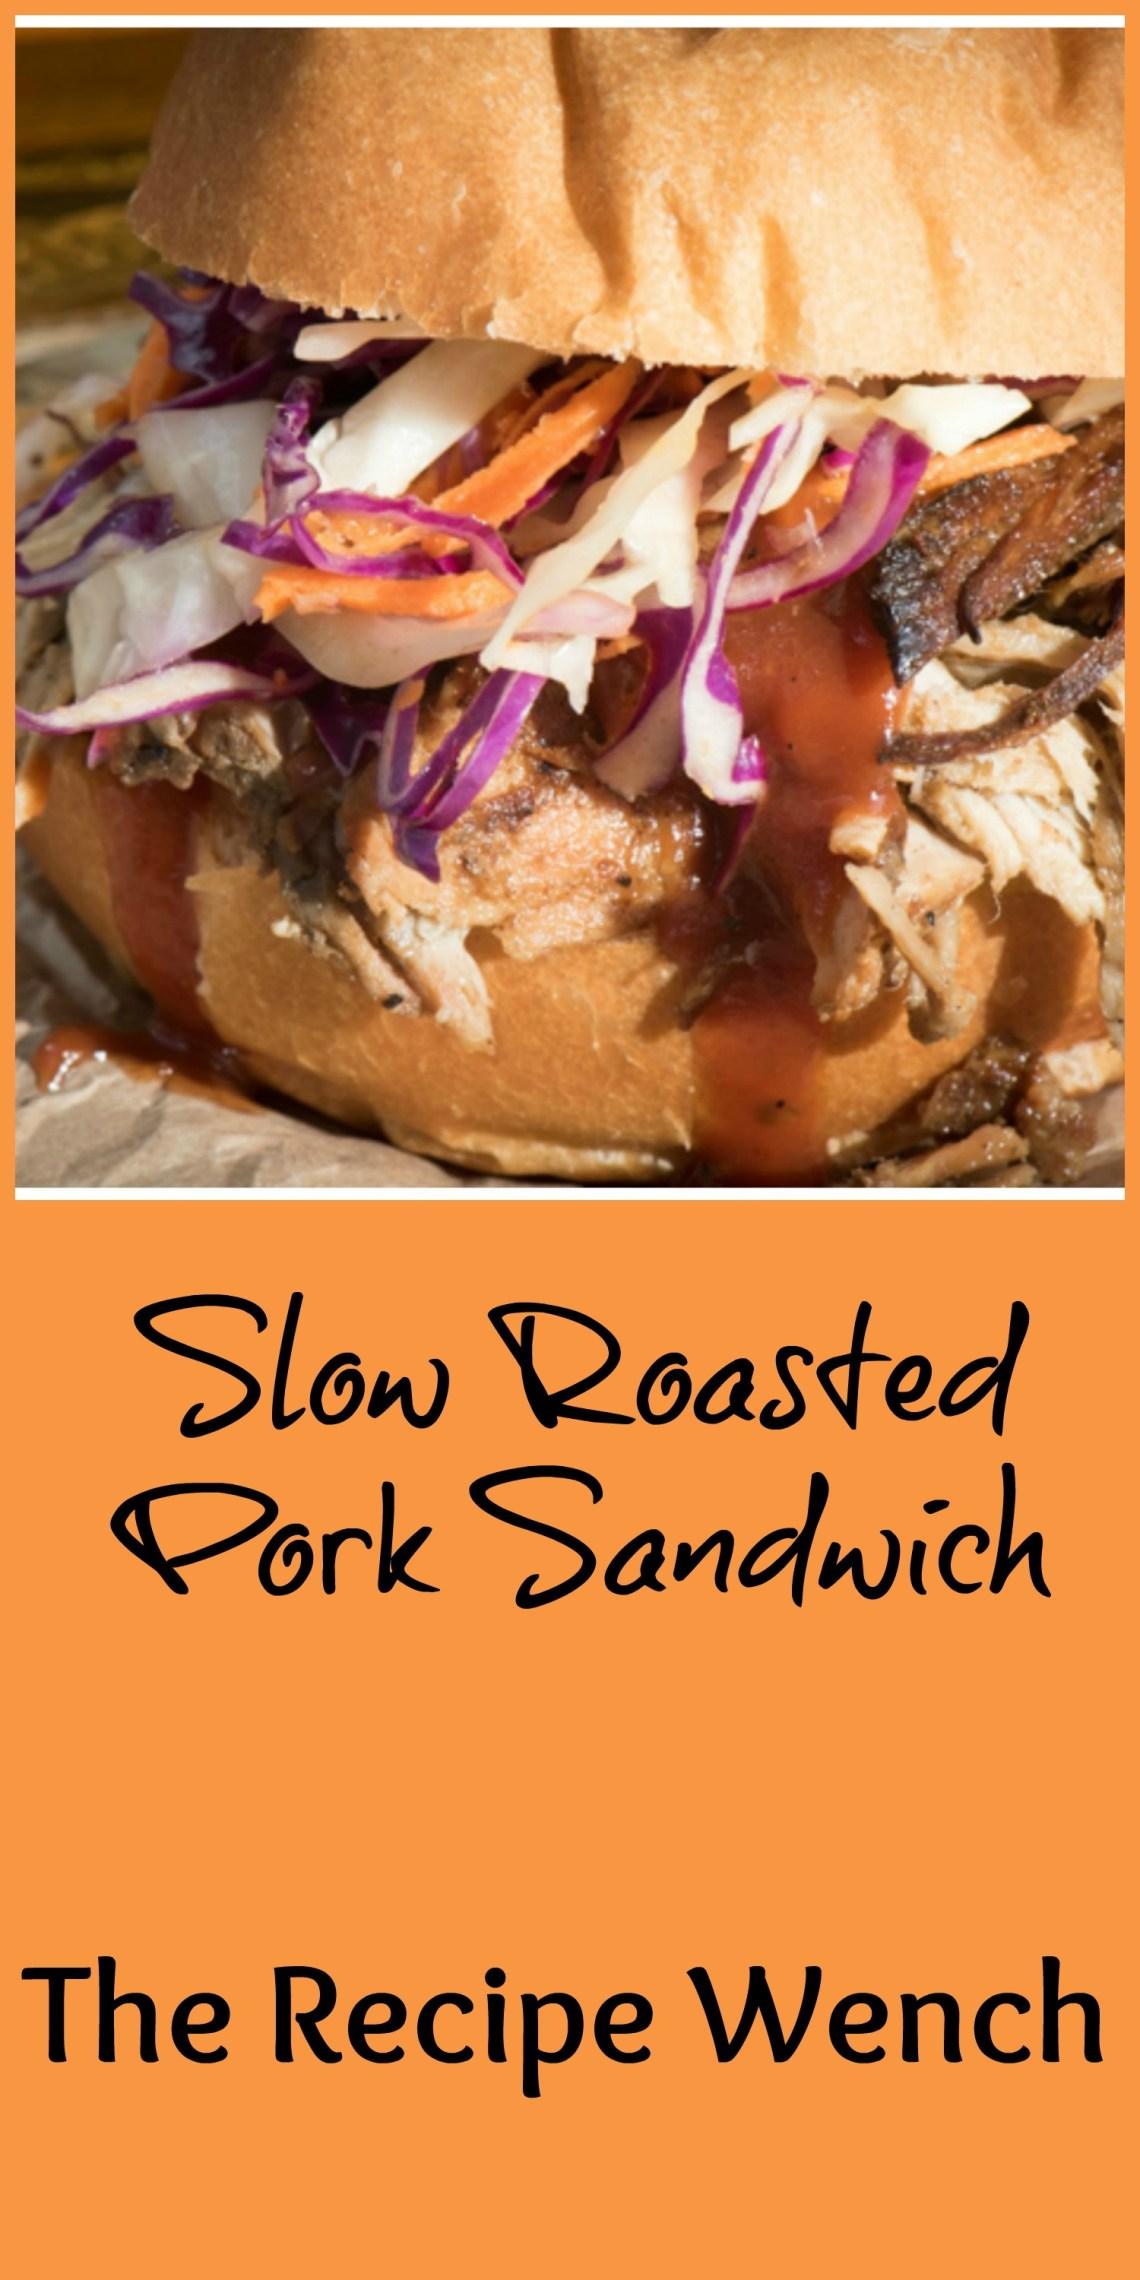 Slow roasted pork sandwich pm